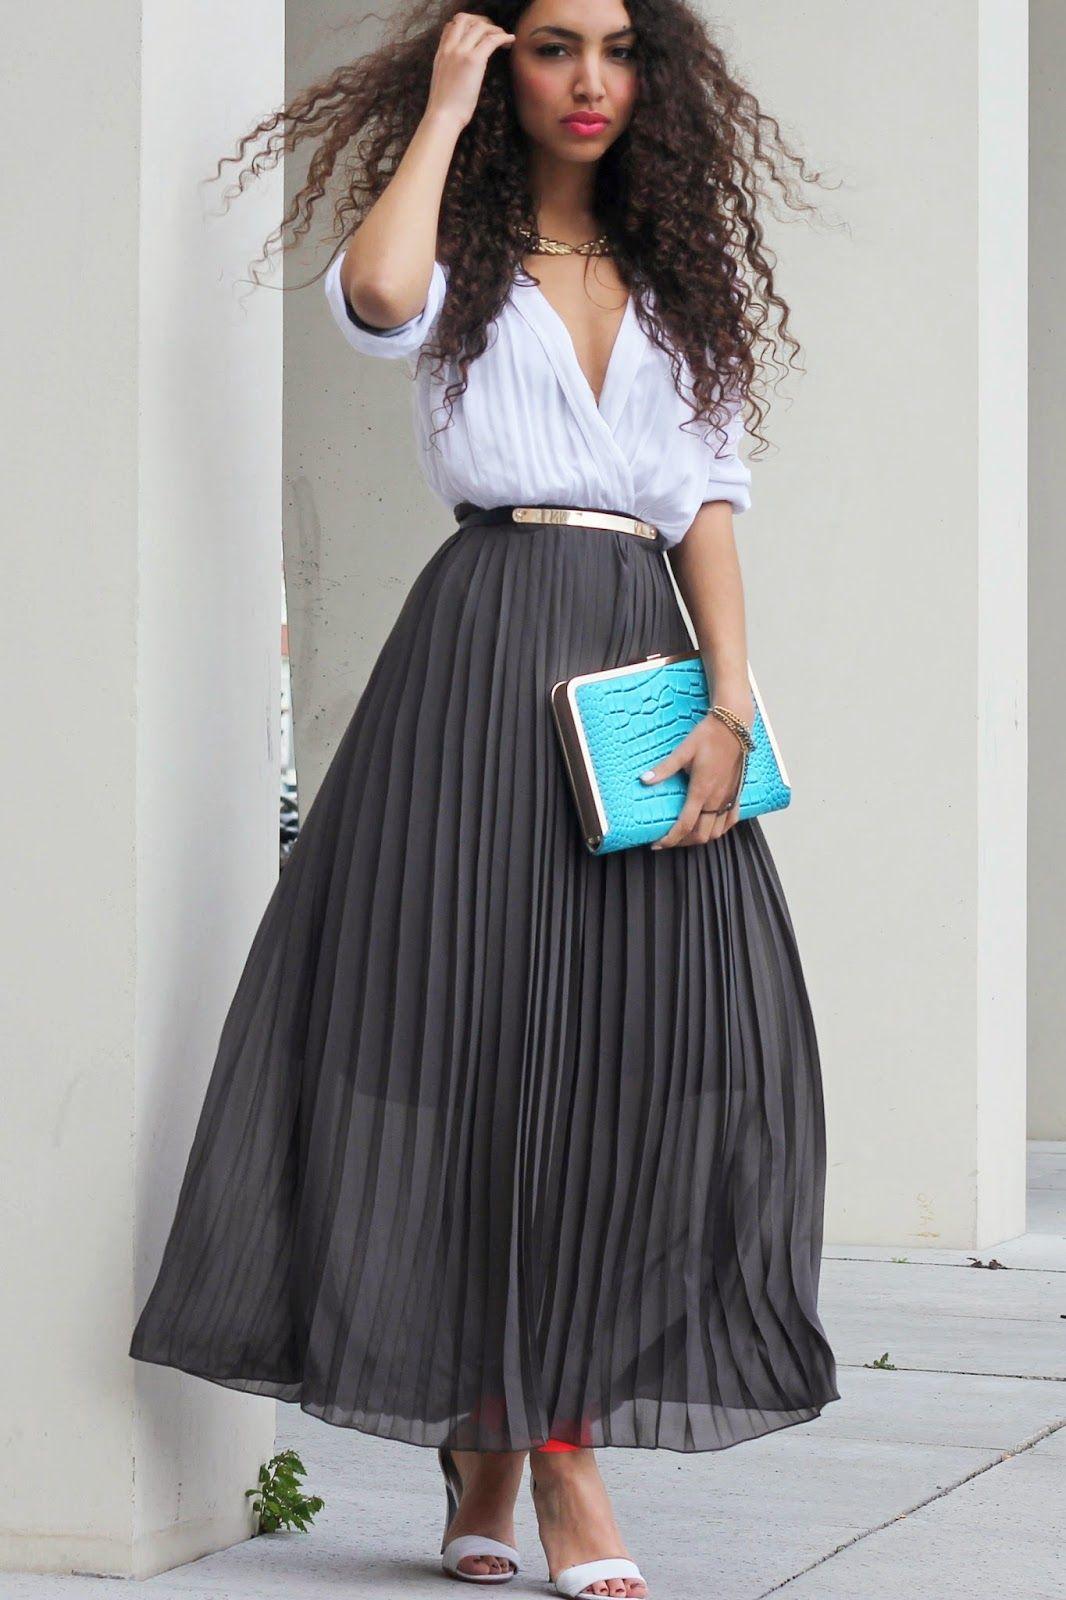 Summum maxi skirt, Inlovewithfashiondress as top, H&M